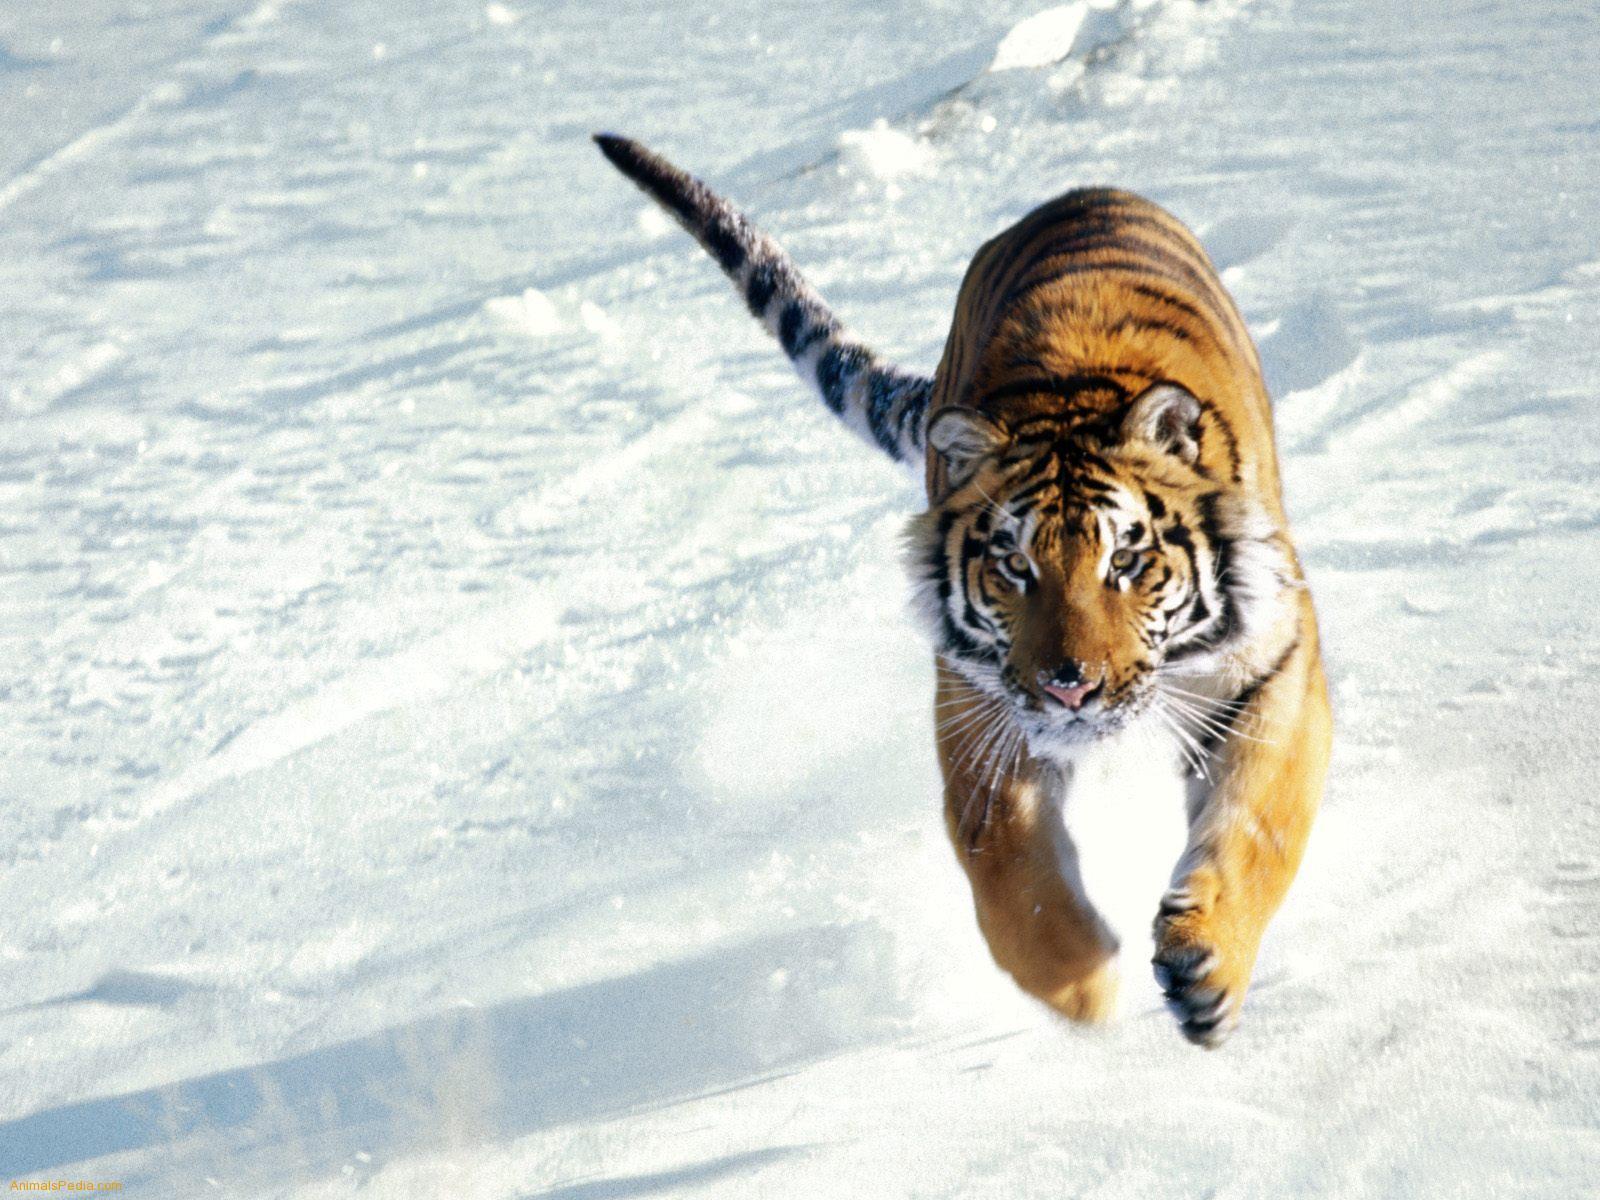 Siberian Tiger Wallpapers - HD Wallpapers Inn